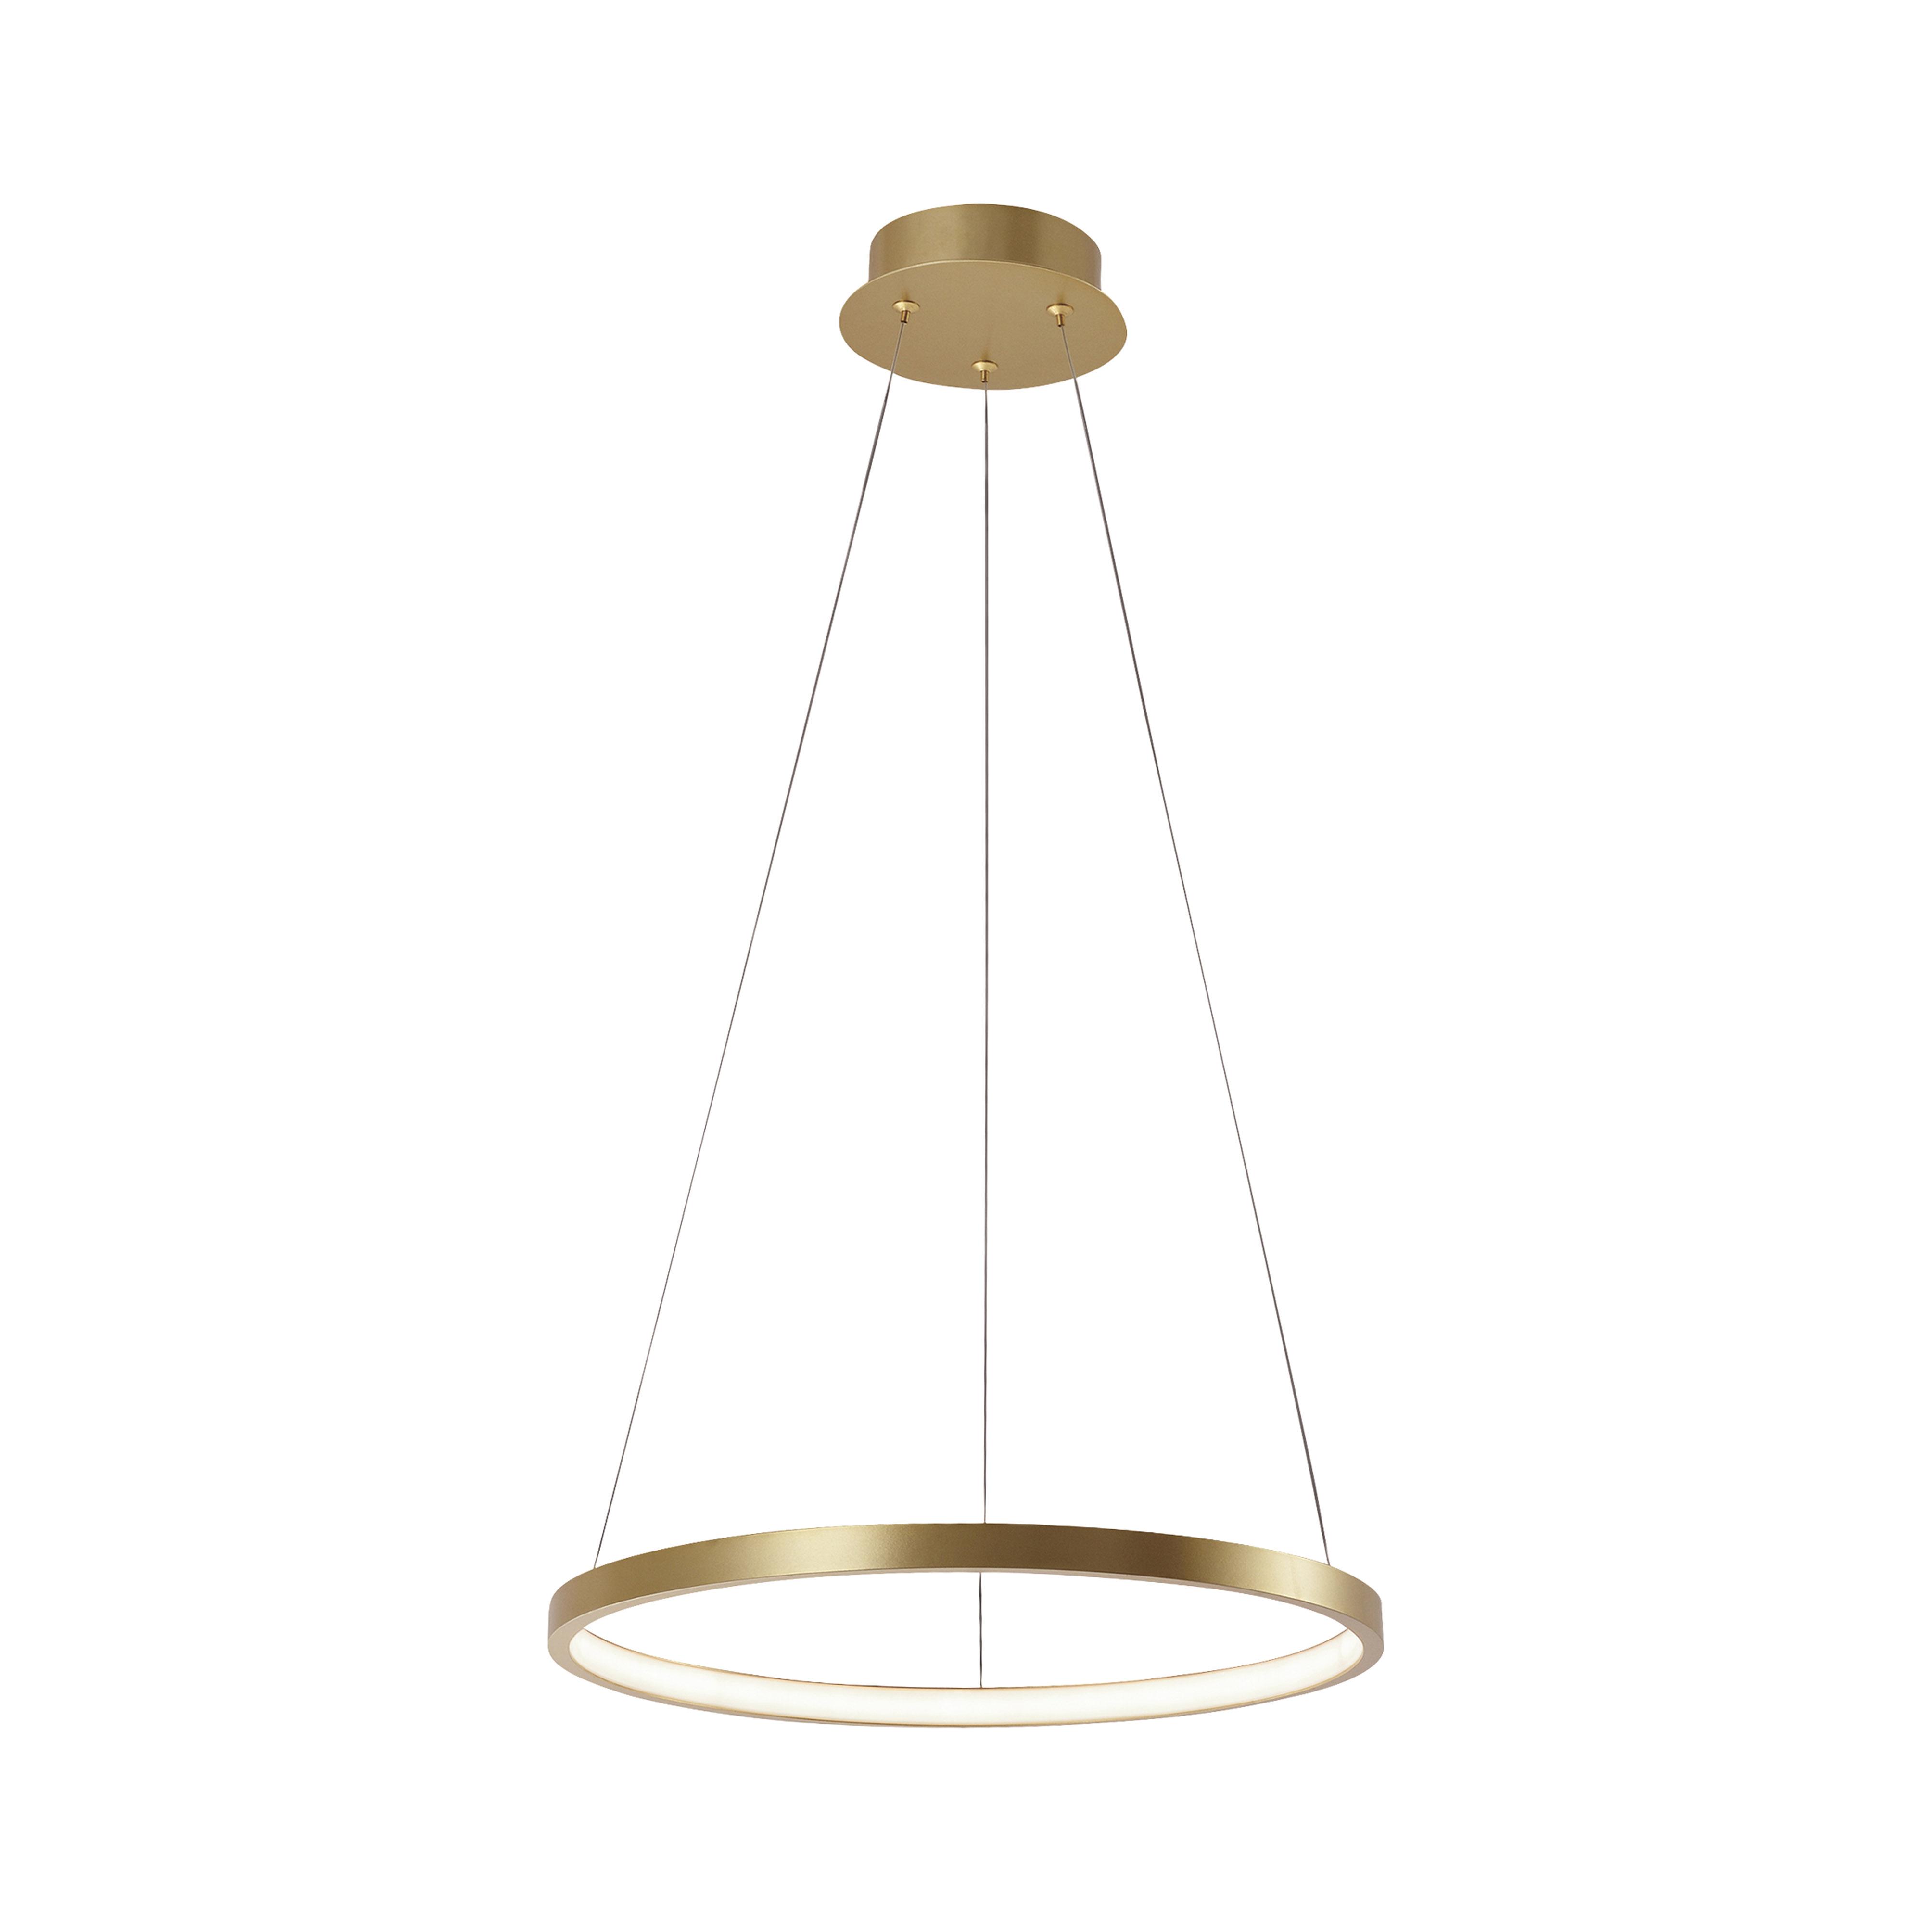 Moderne ring hanglamp goud 40cm incl. LED - Anella